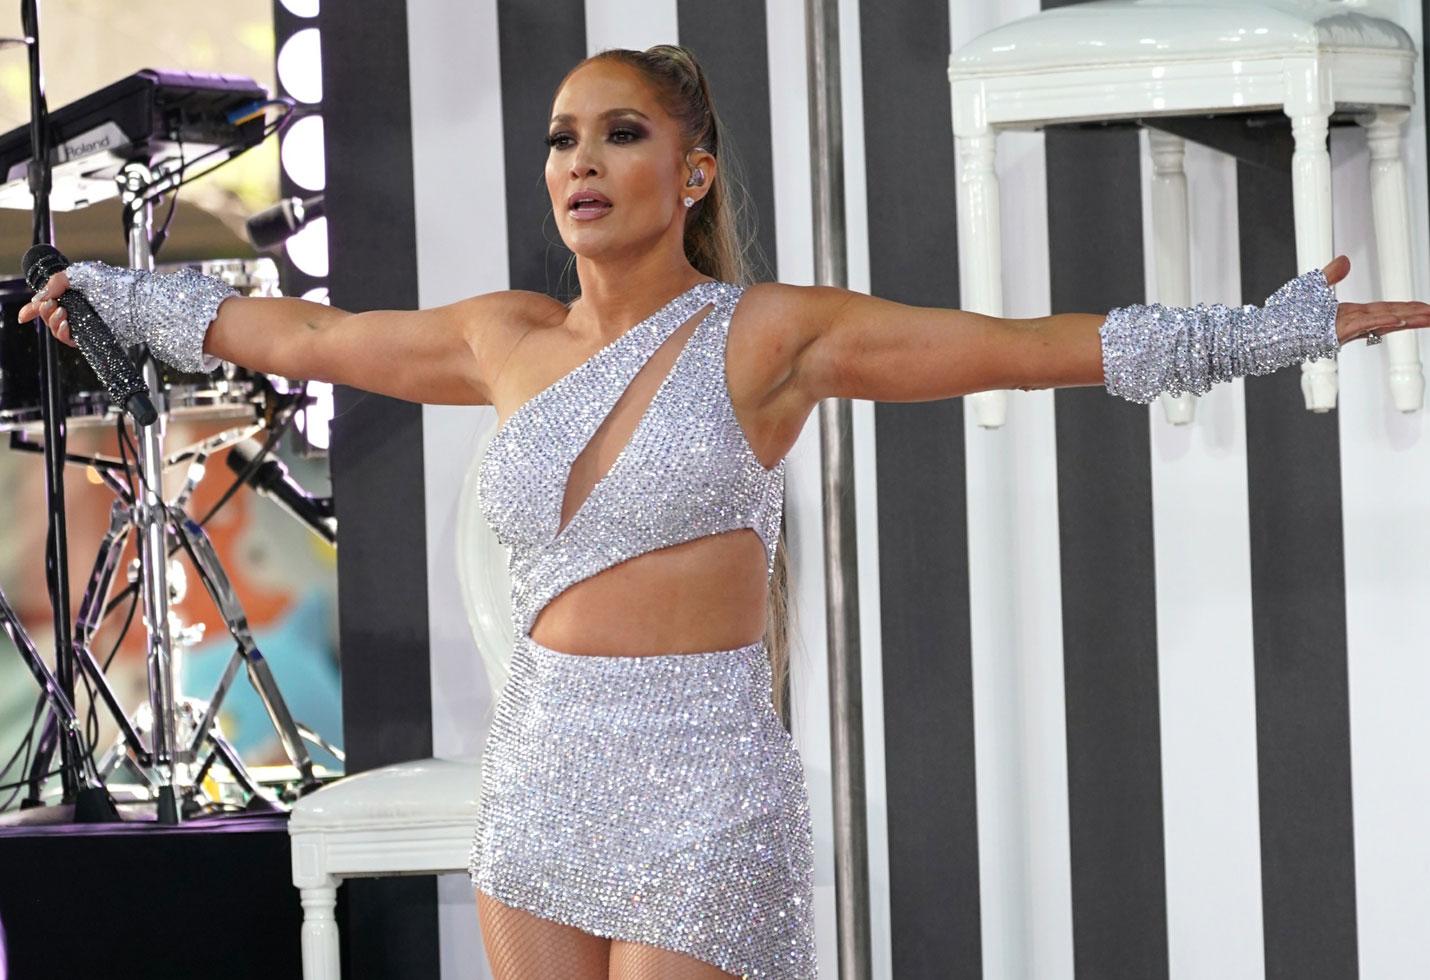 Jennifer lopez revealing costumes today show concert